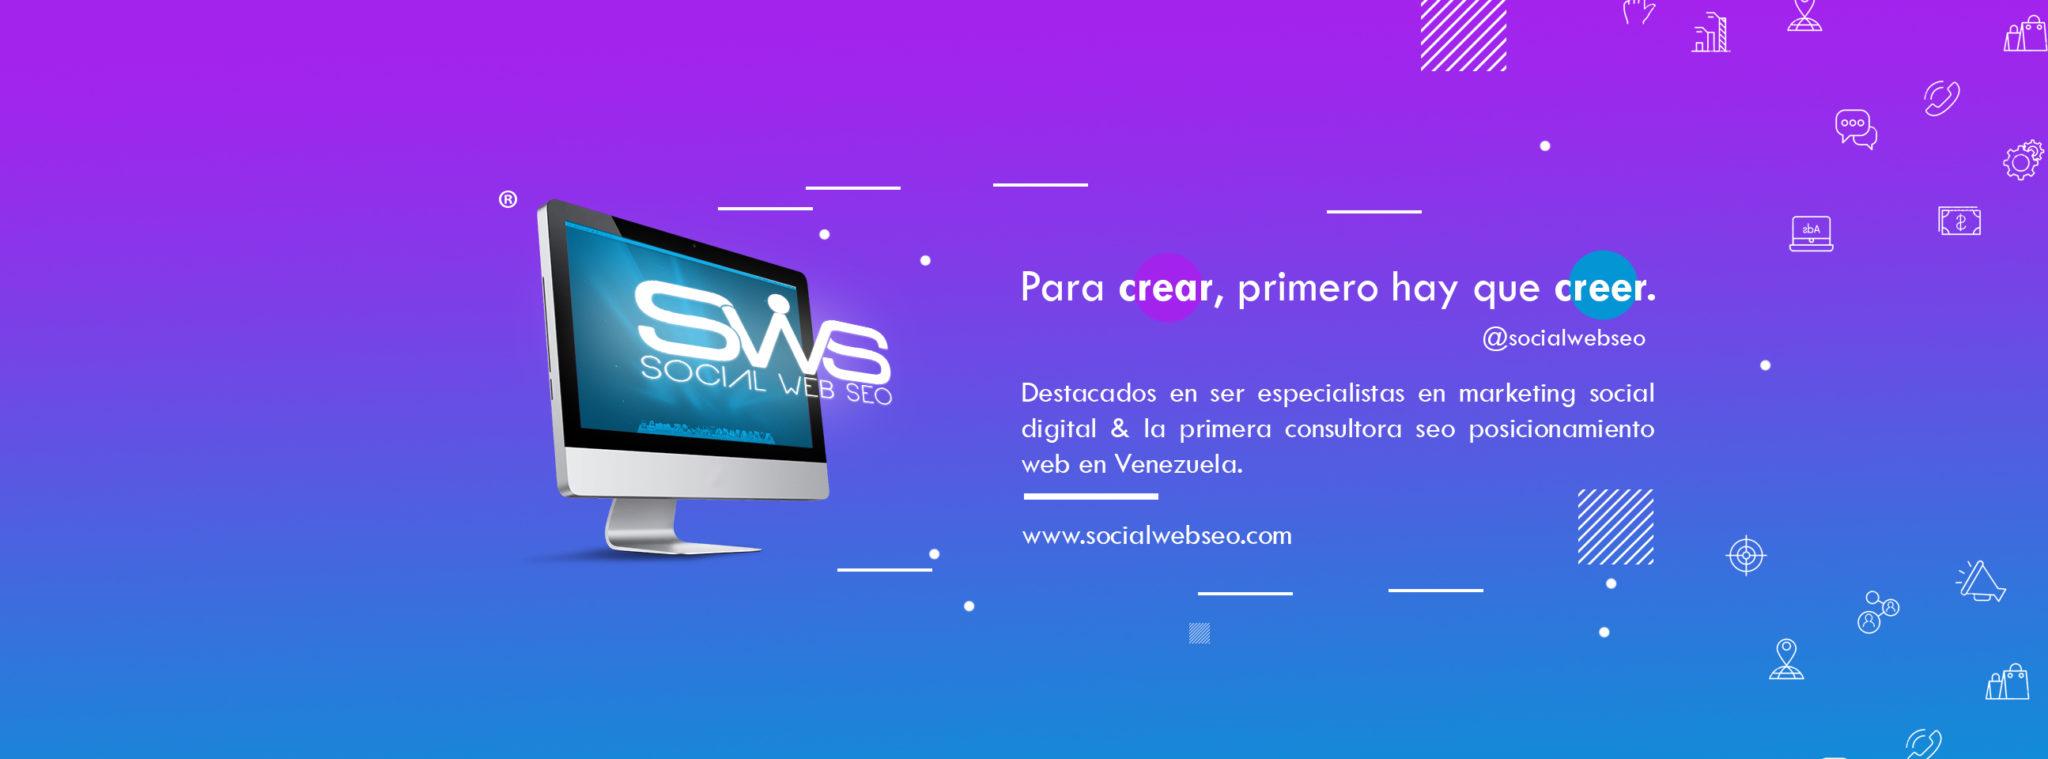 Portada Top Social Web SEO Venezuela